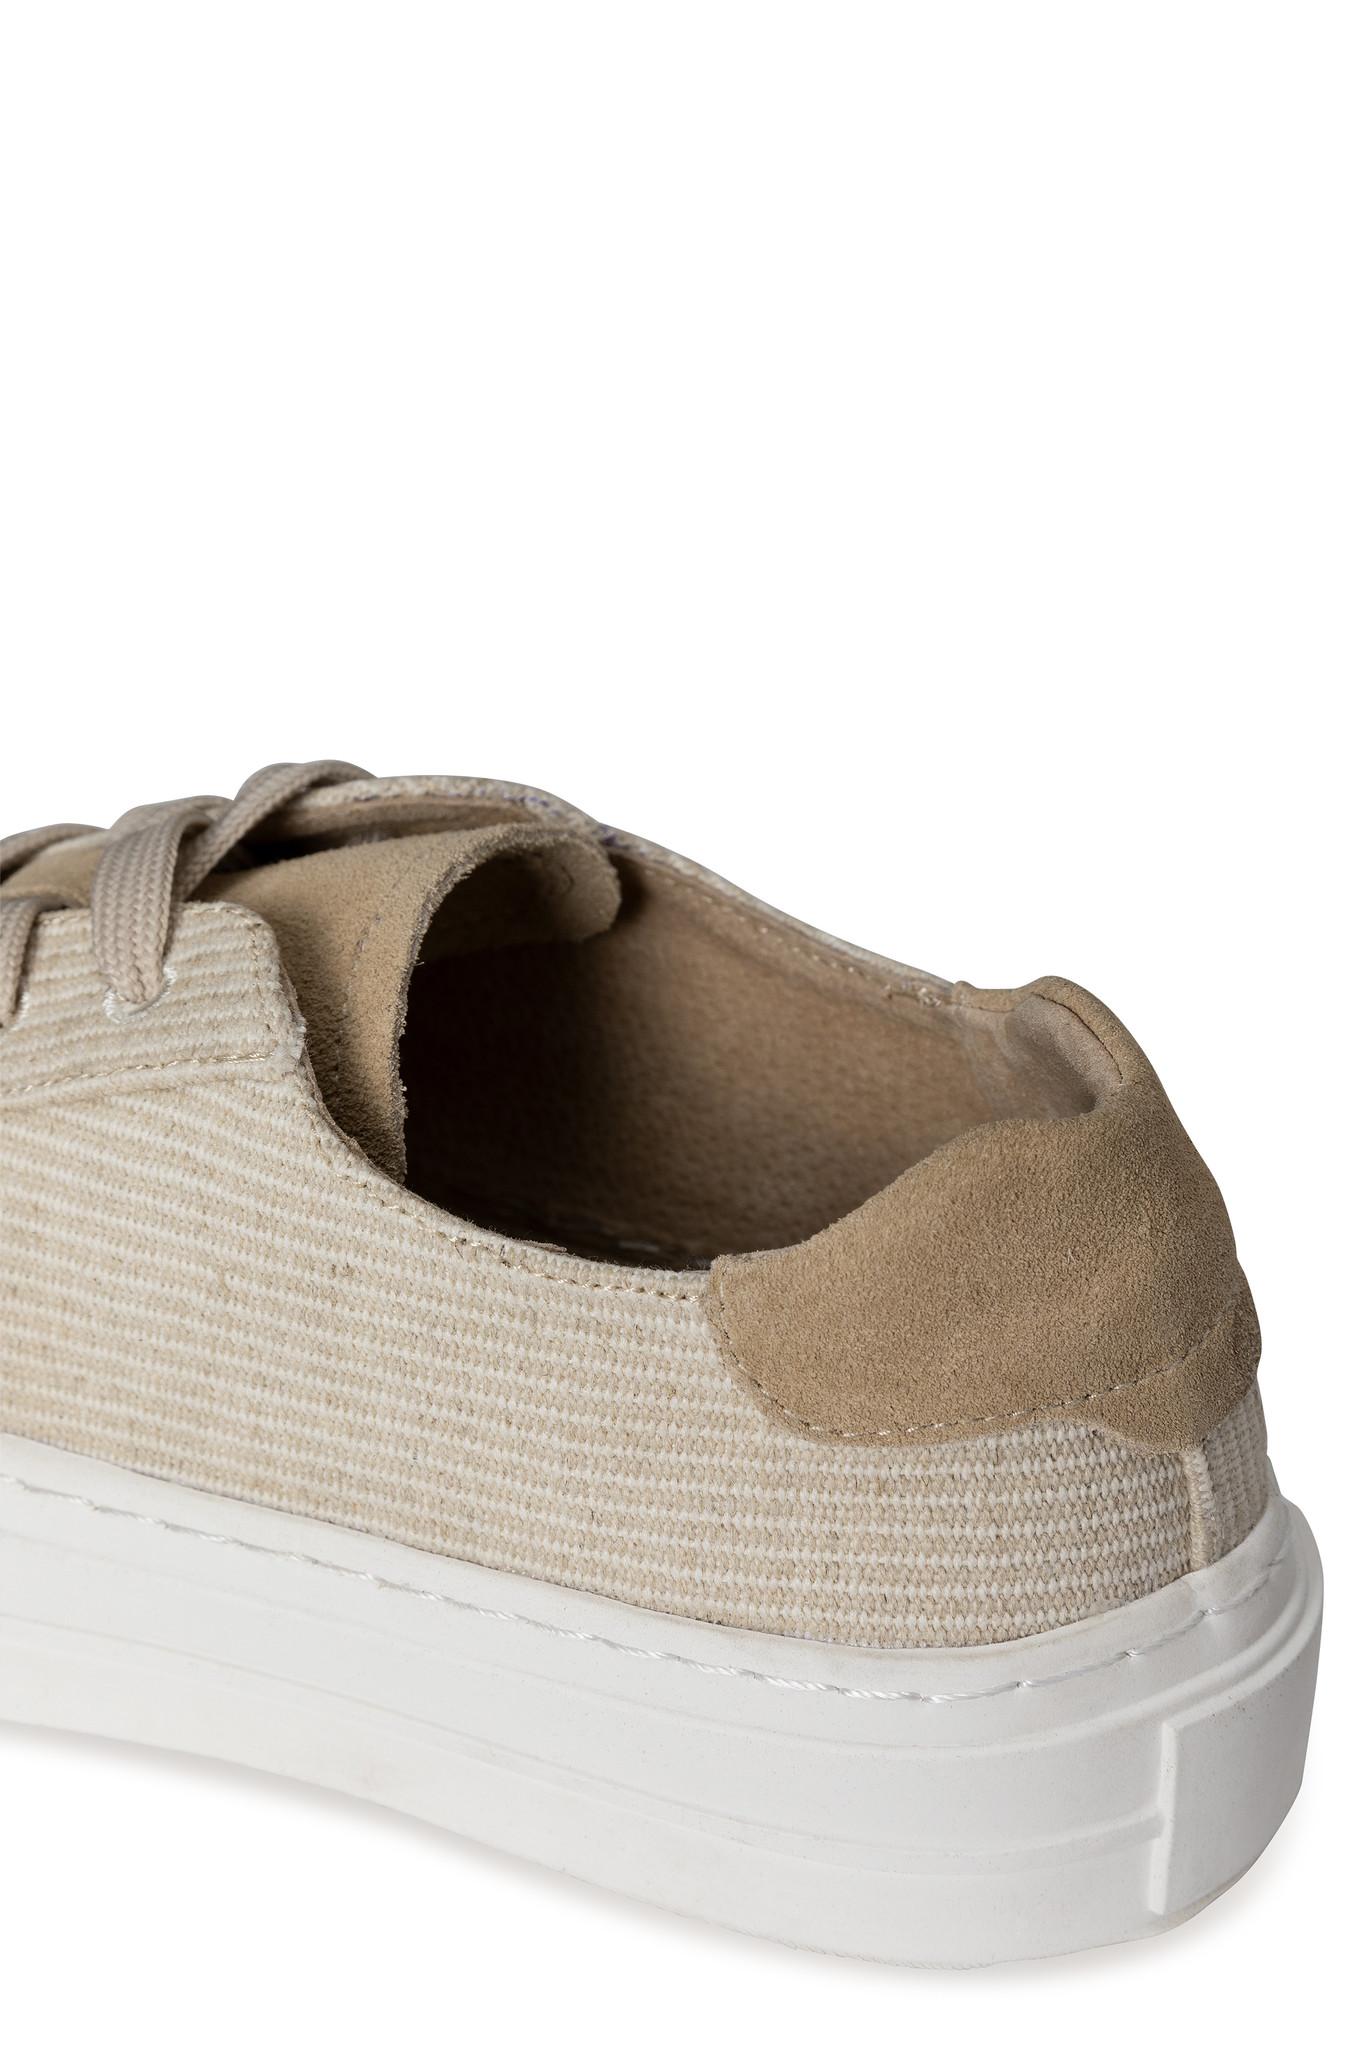 yaya Jacquard sneaker 134374-113-4